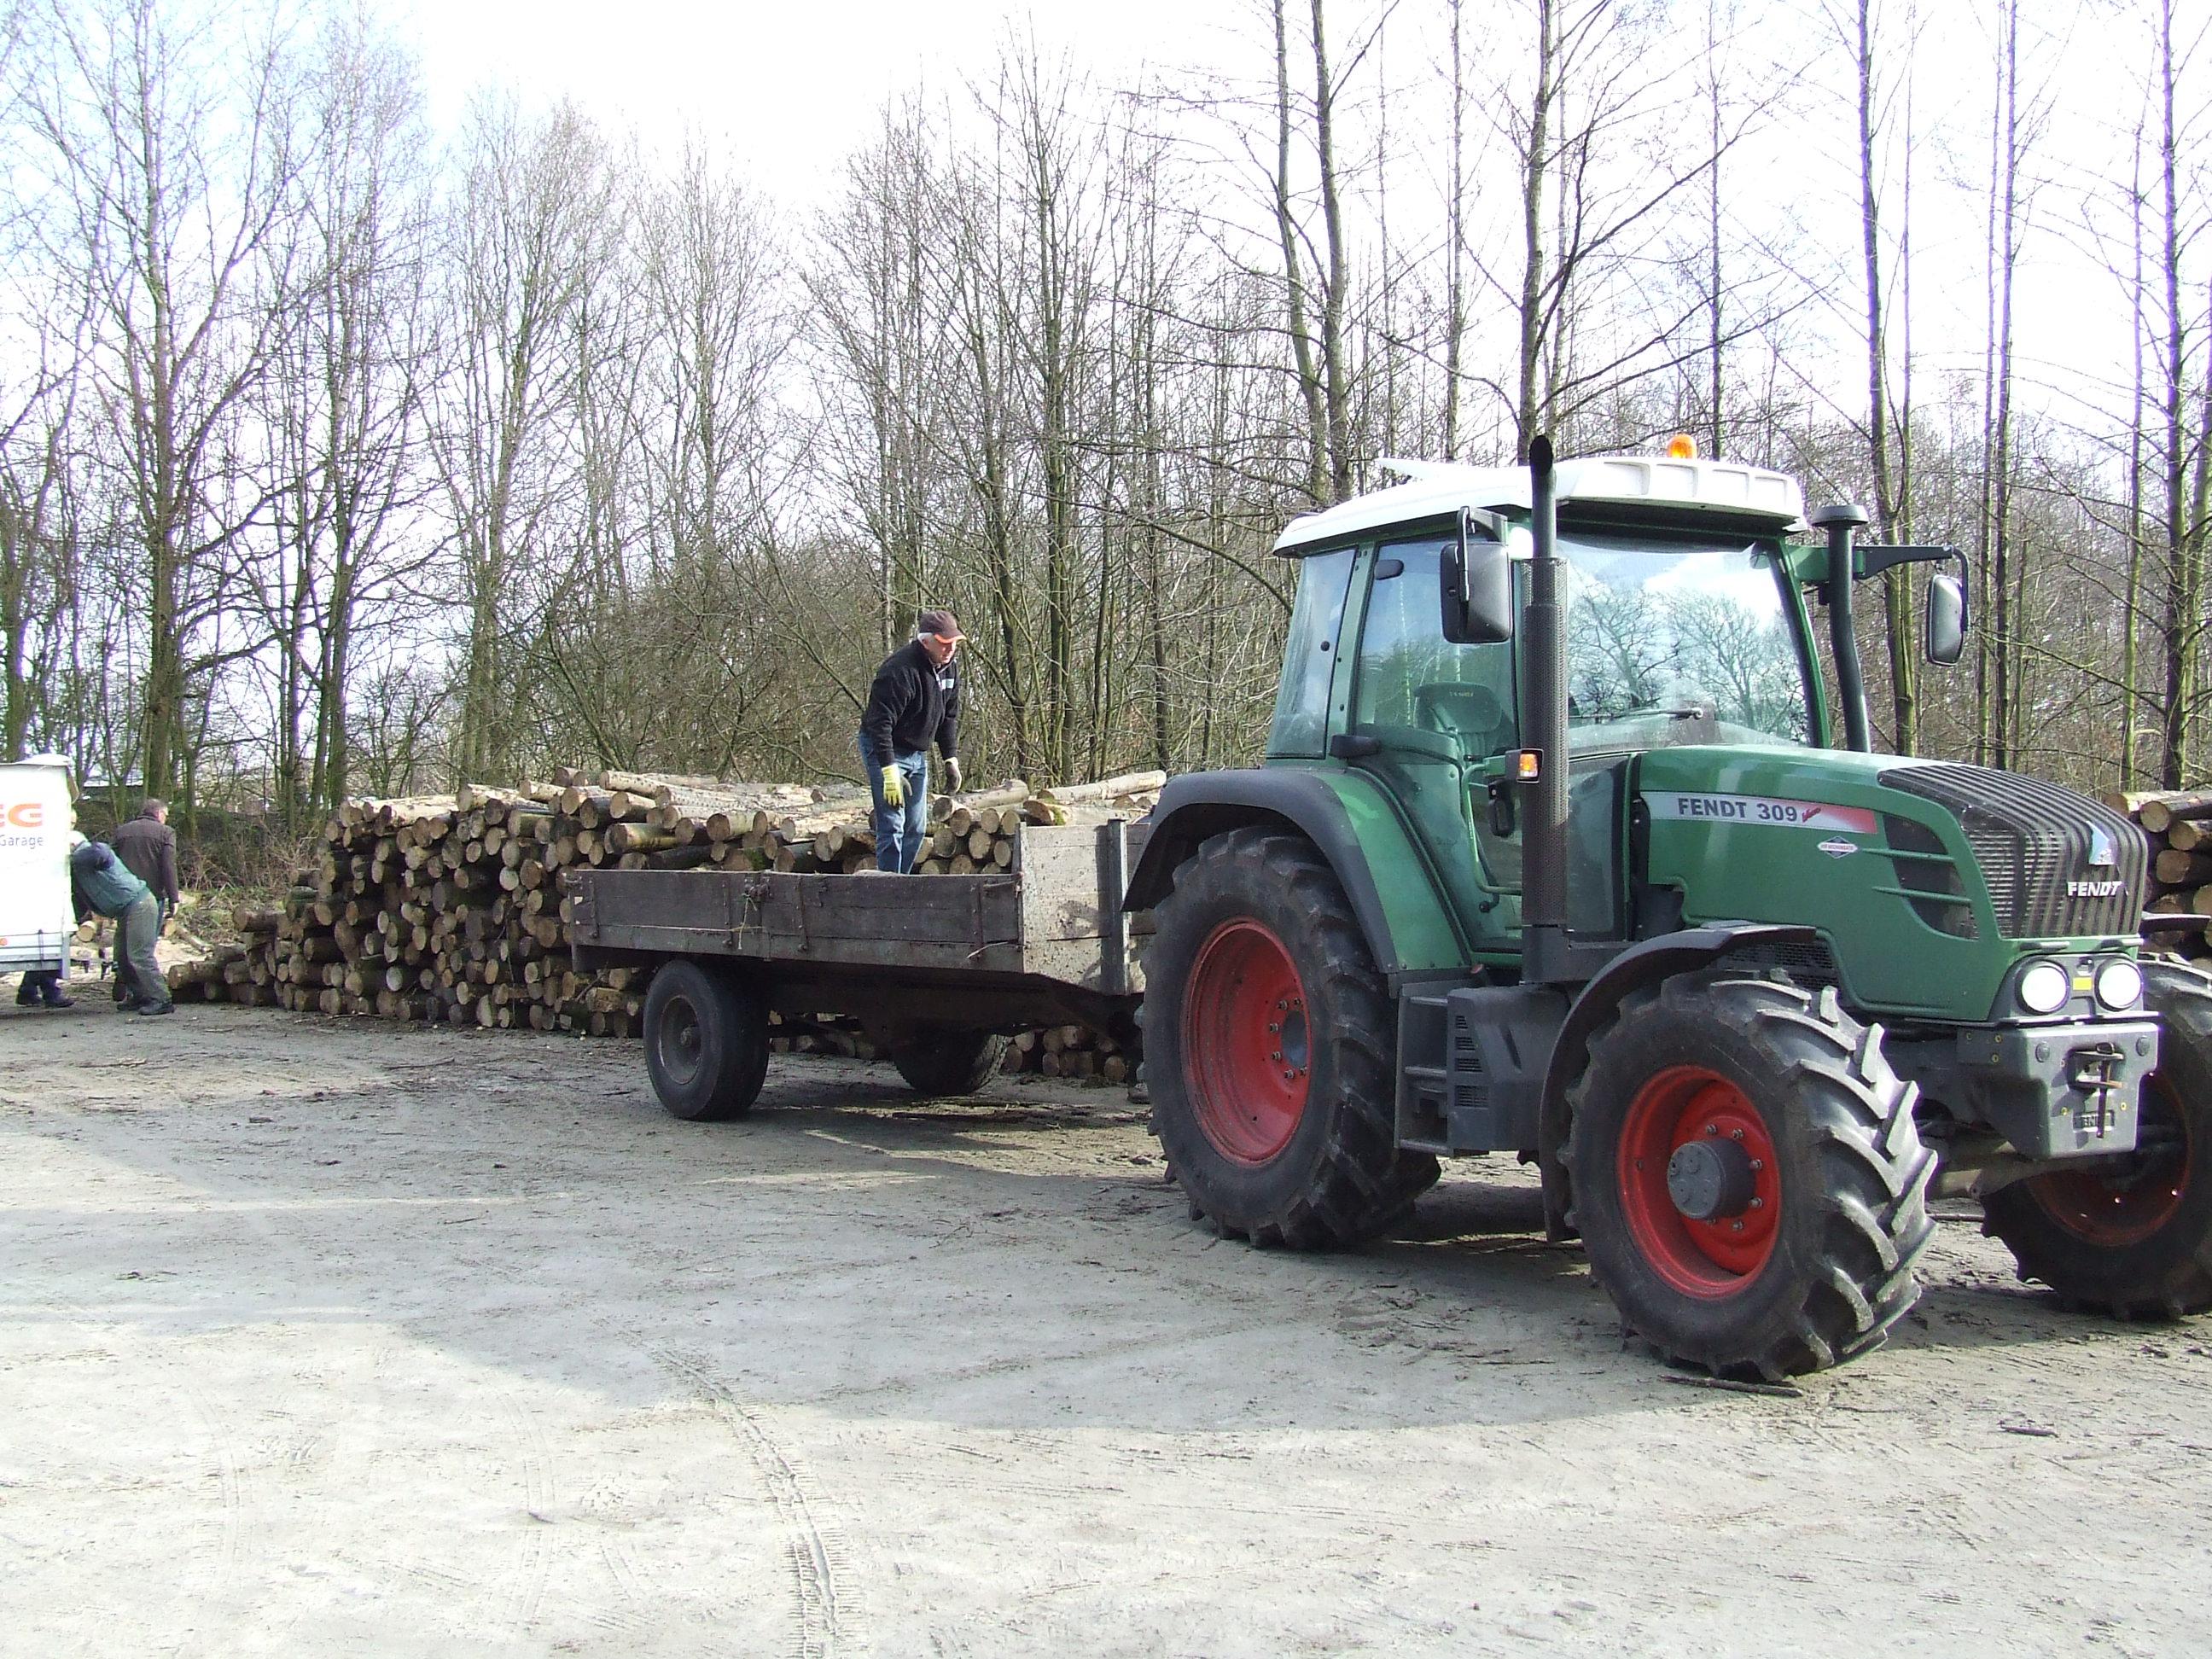 Haardhoutdag Drents-Friese Wold